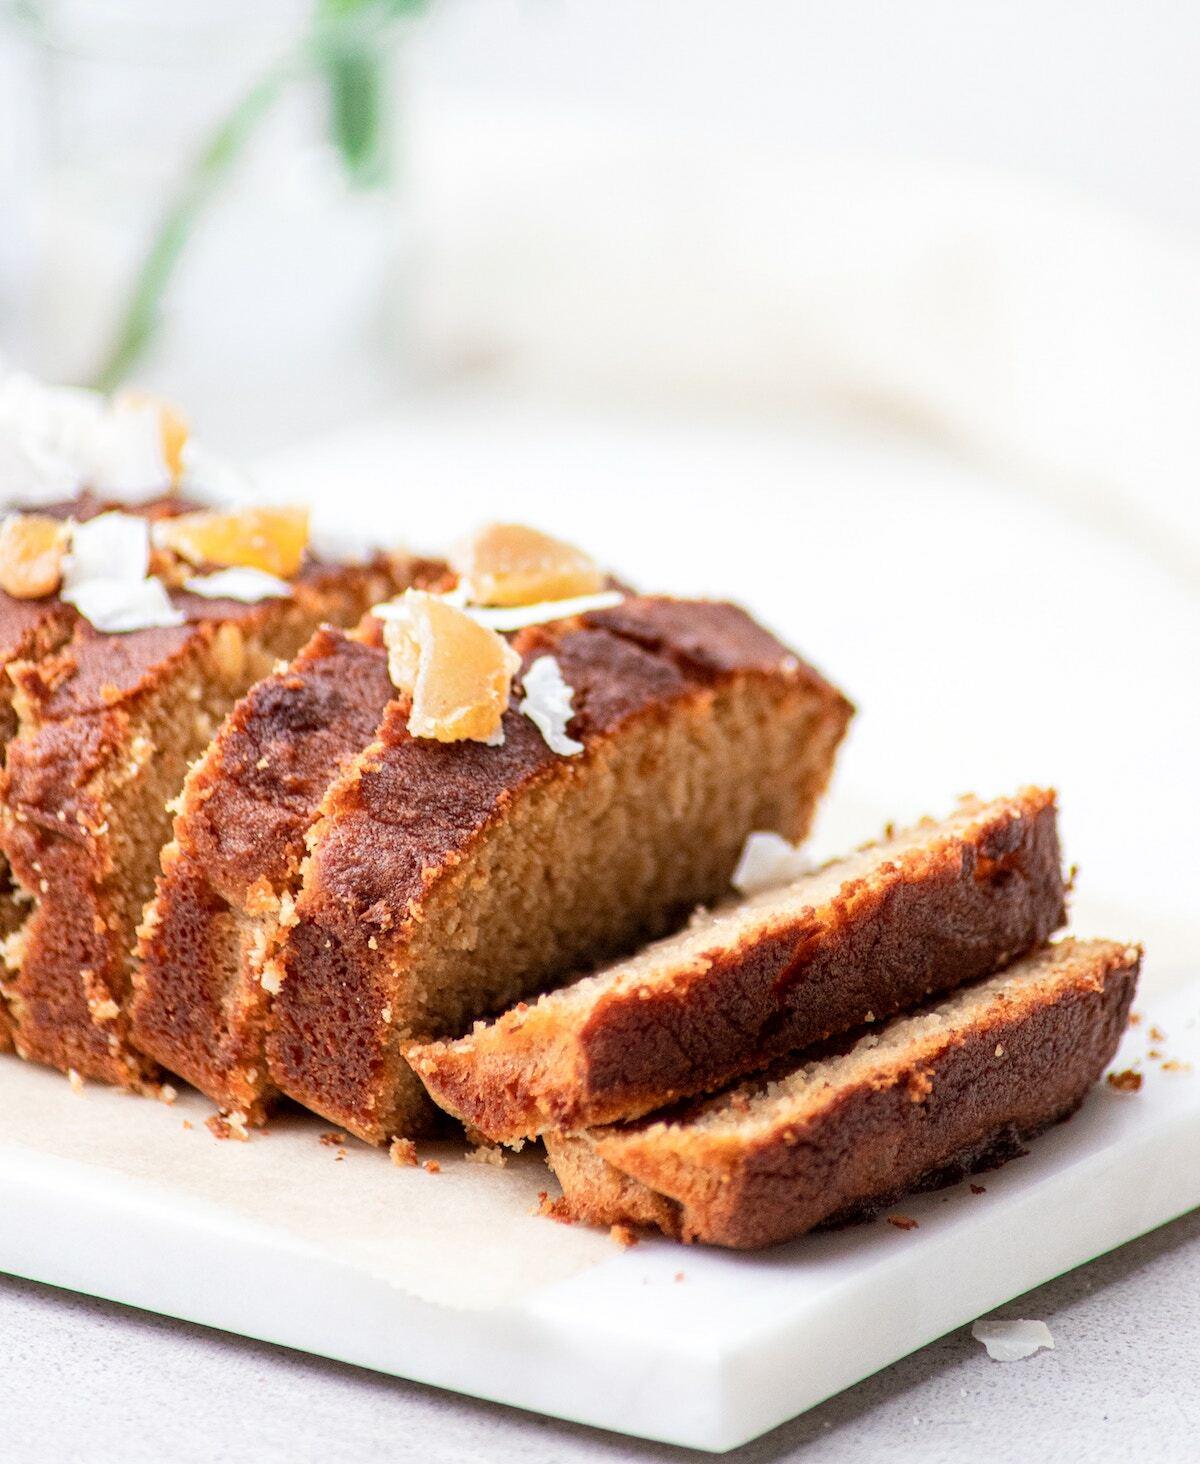 Cake au gingembre confit